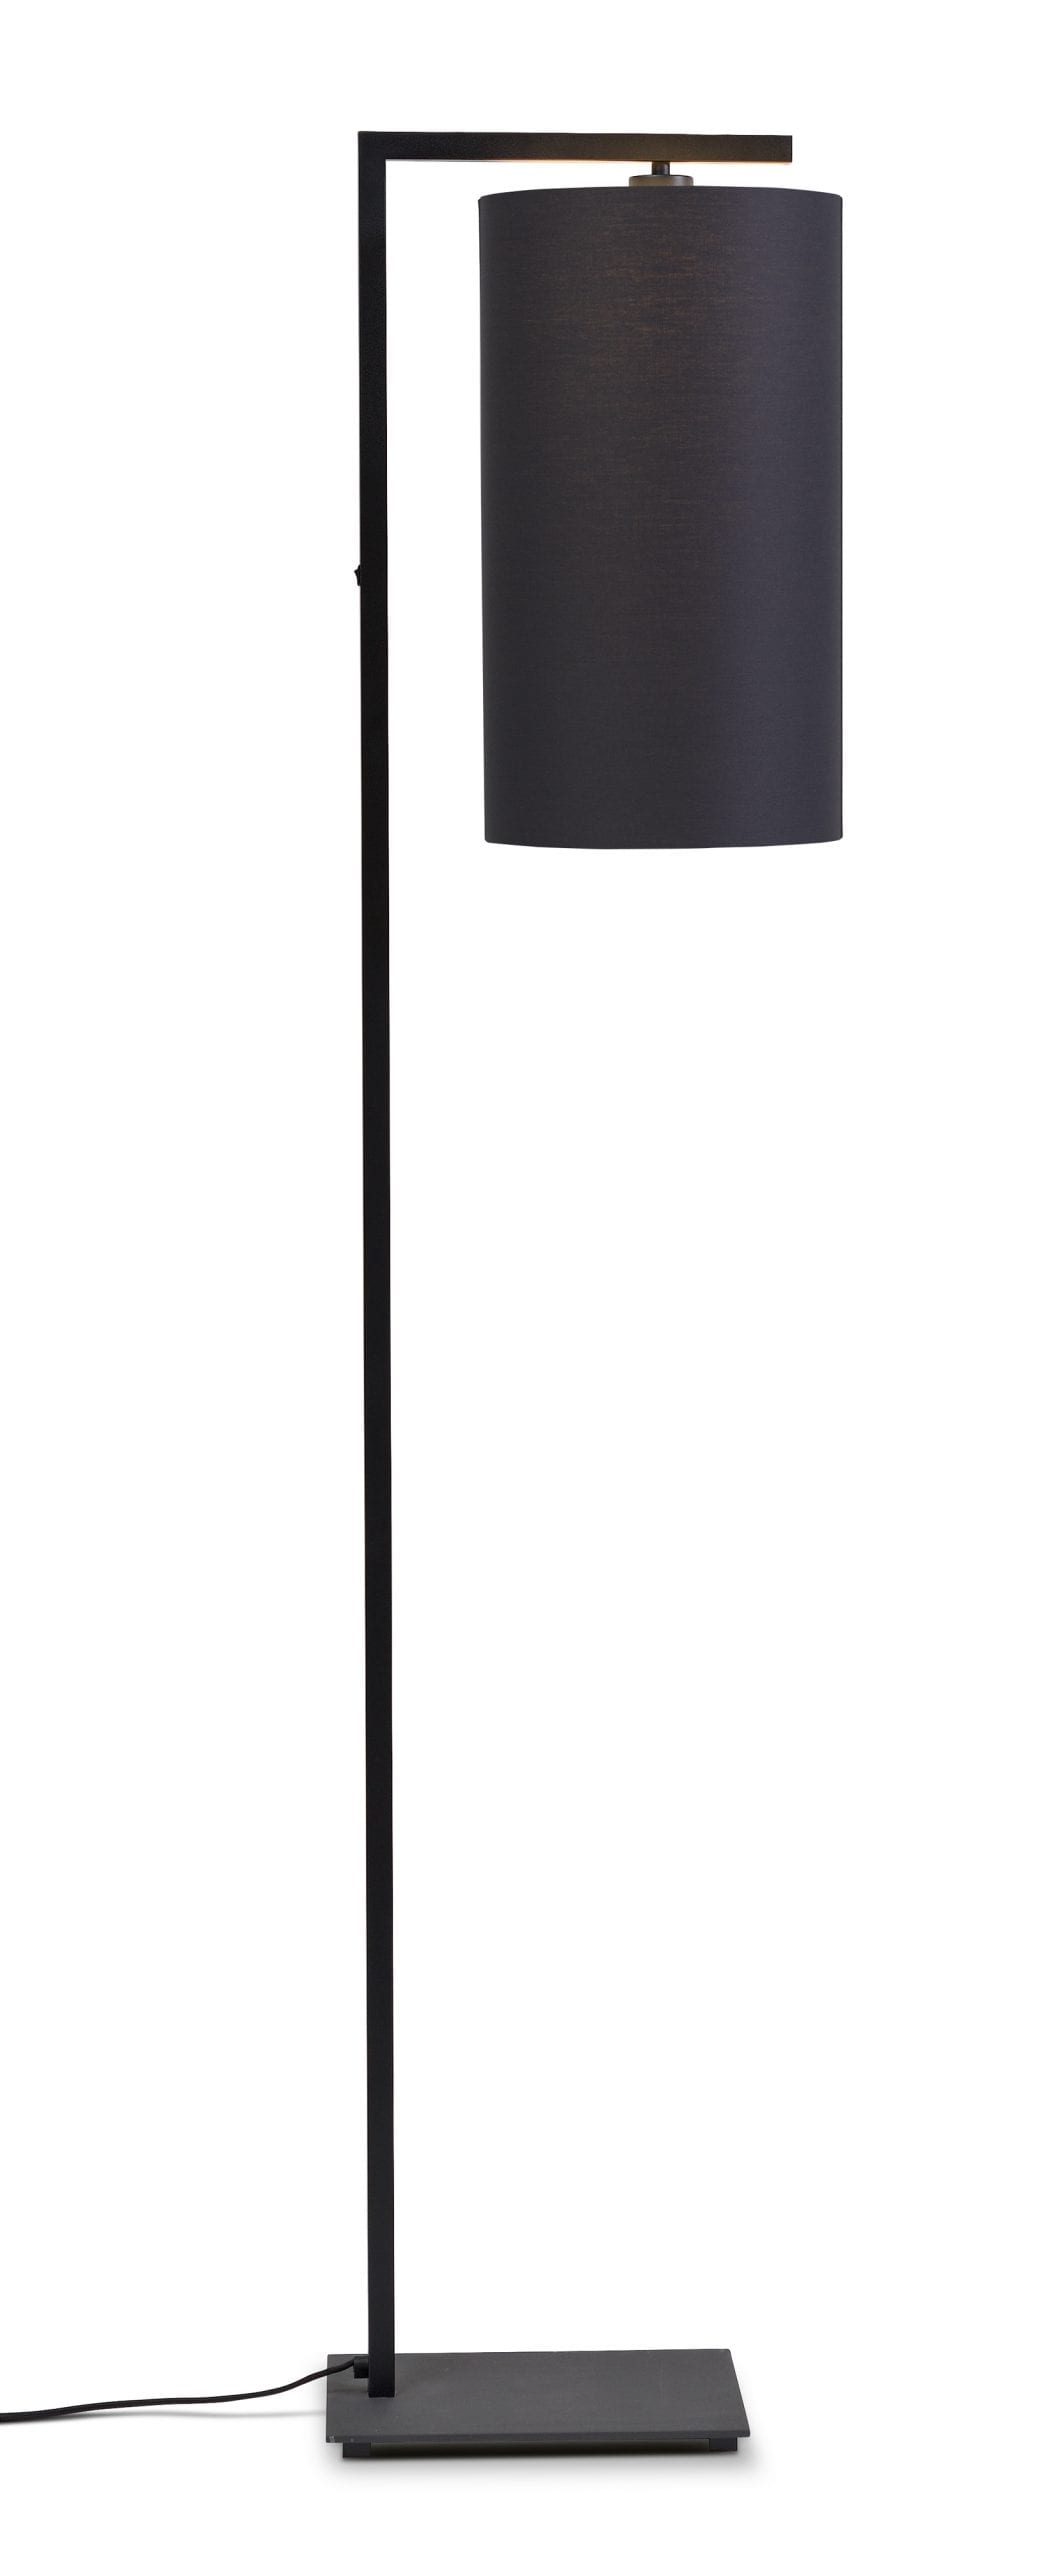 Vloerlamp Boston - Black/Dark Grey